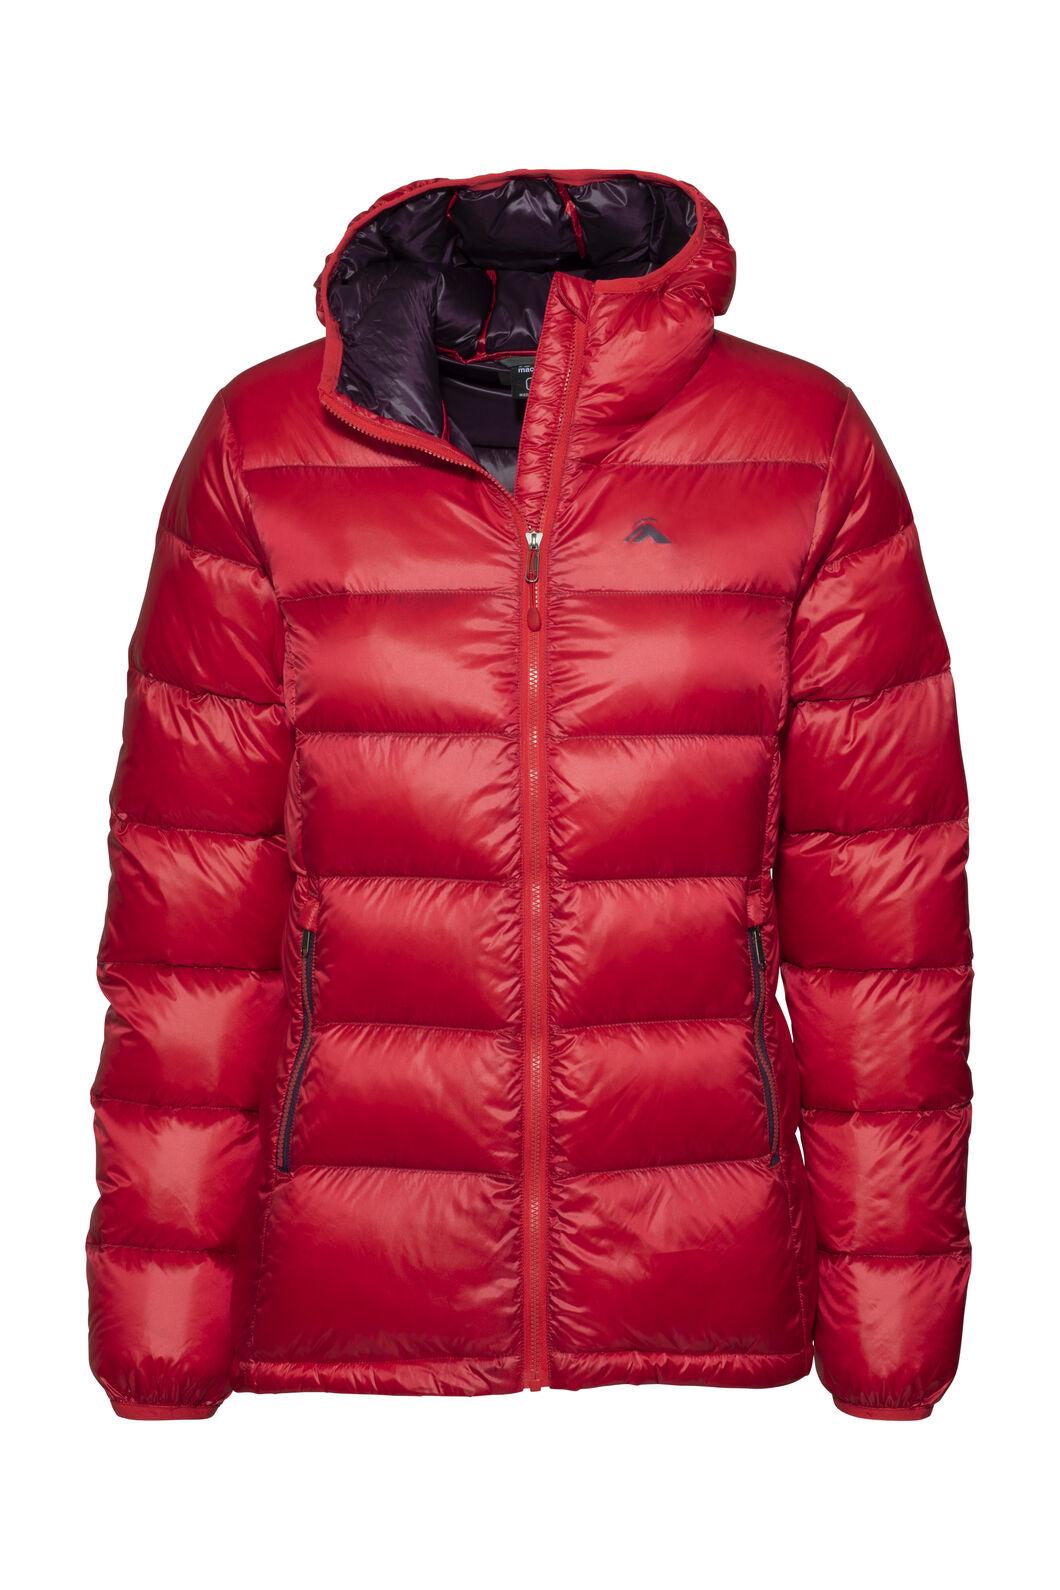 Macpac Jupiter Hooded Down Jacket — Women's, Lollipop, hi-res